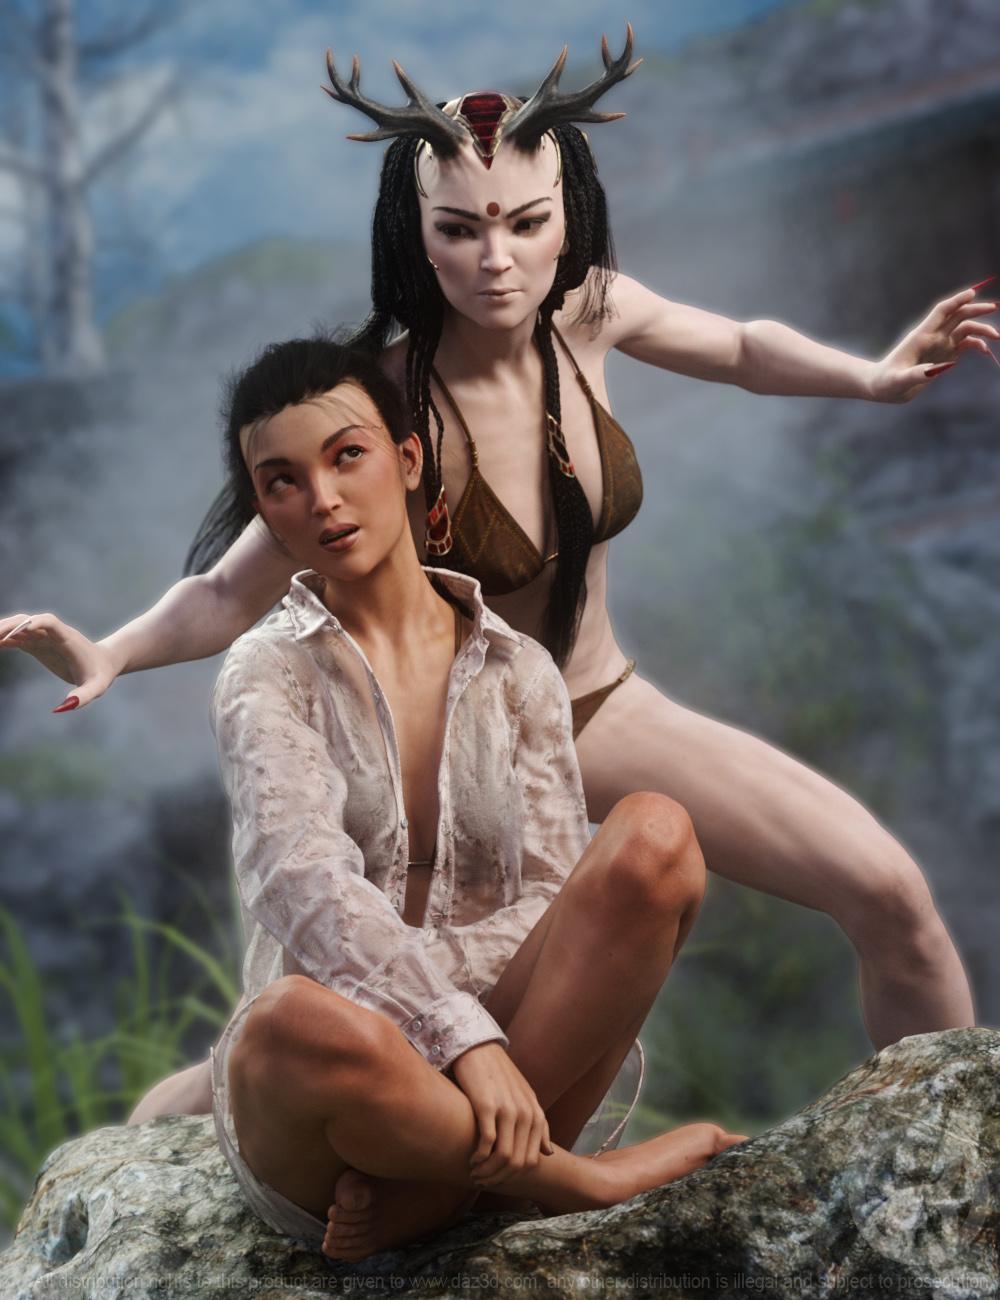 Shika for Genesis 8.1 Female by: RawArt, 3D Models by Daz 3D